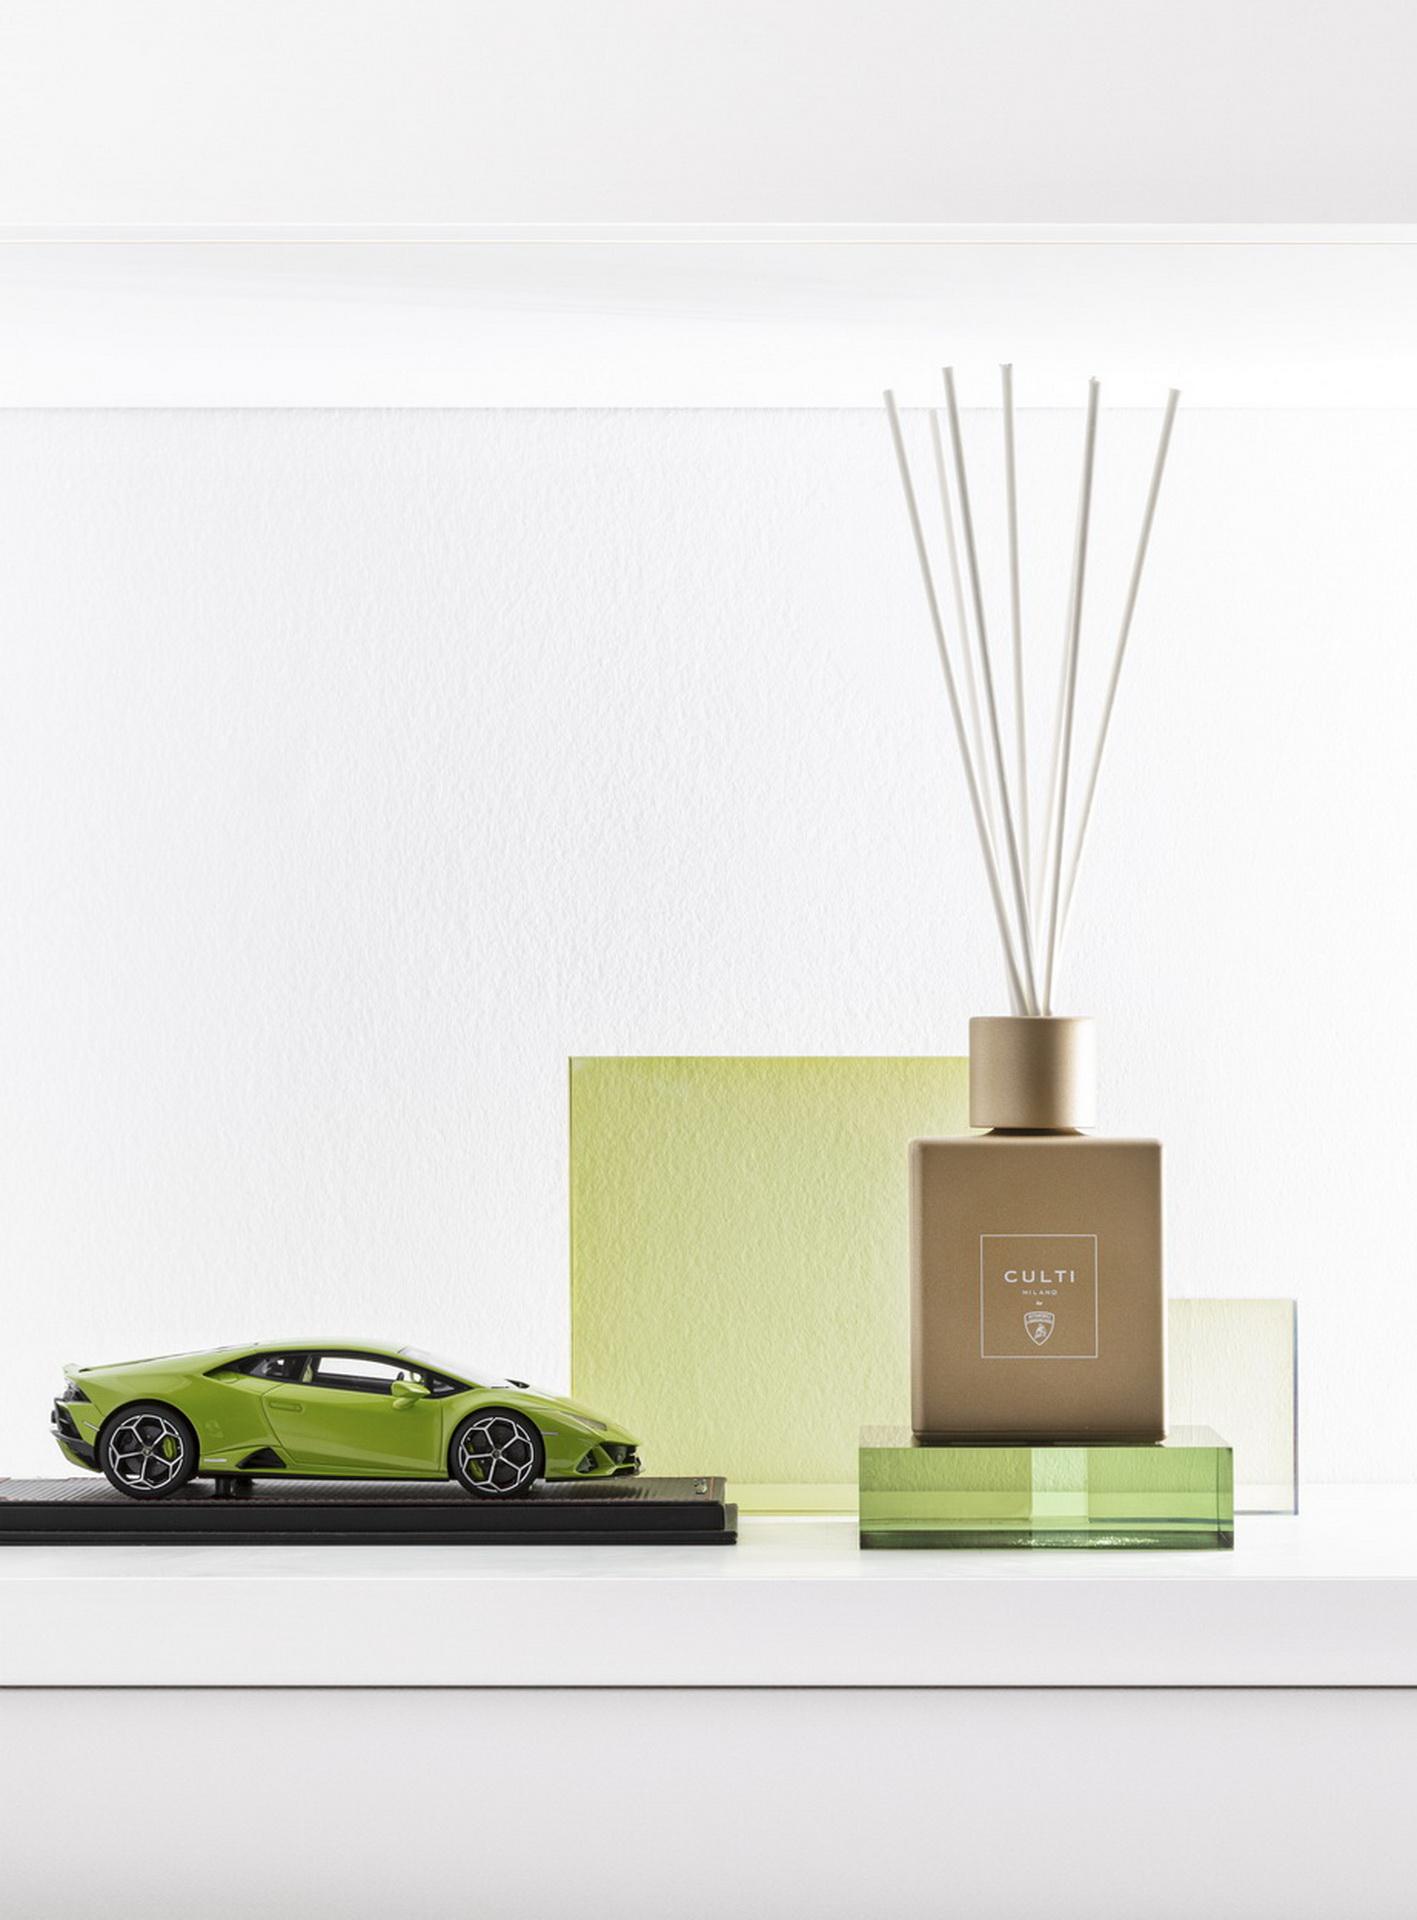 Automobili Lamborghini создали парфюмерный проект в коллаборации с Culti Milano